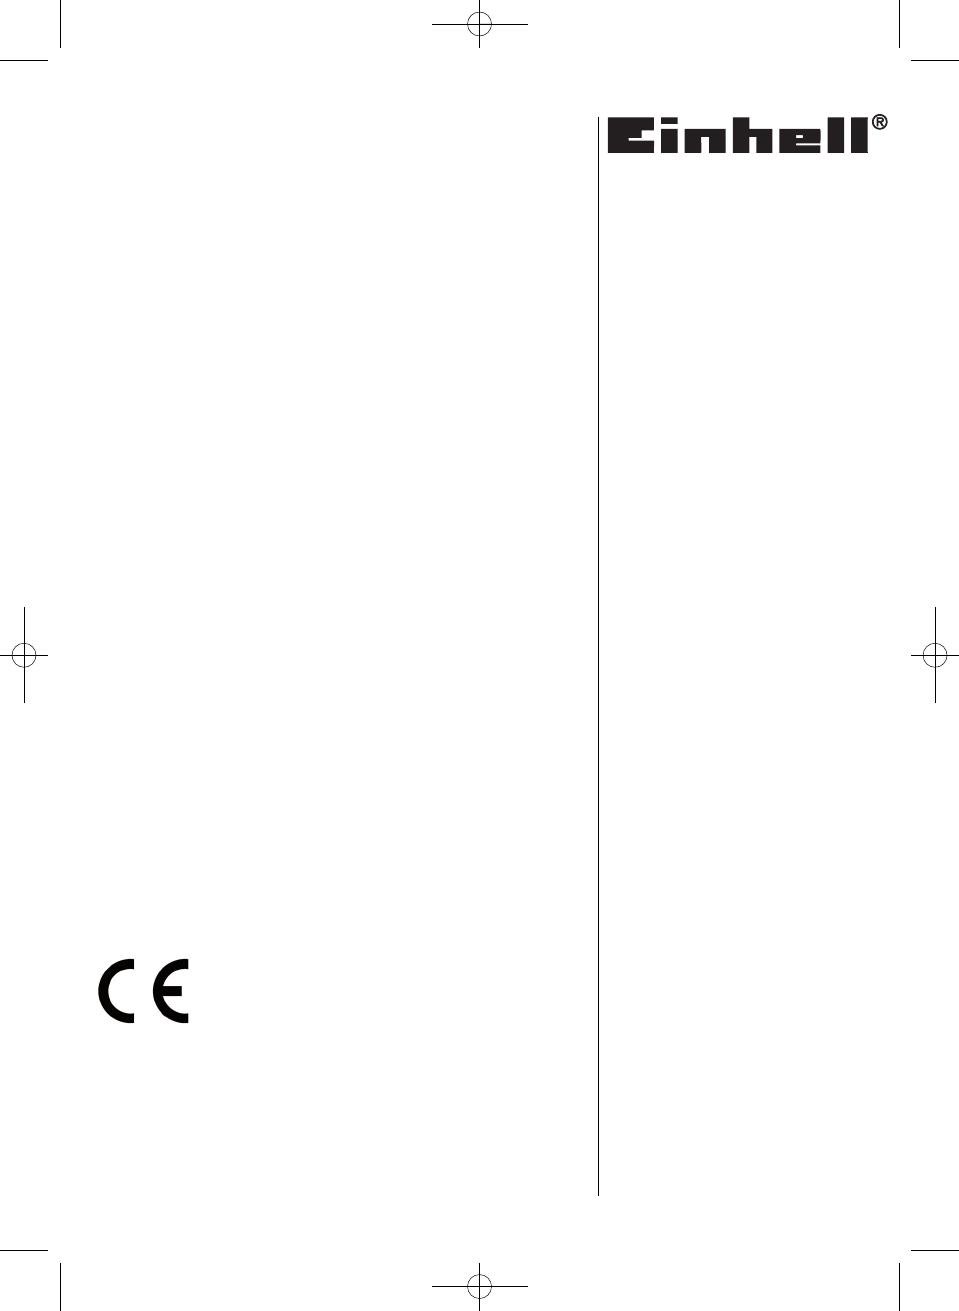 Einhell tischkreissäge tc-ts 2025/1 u